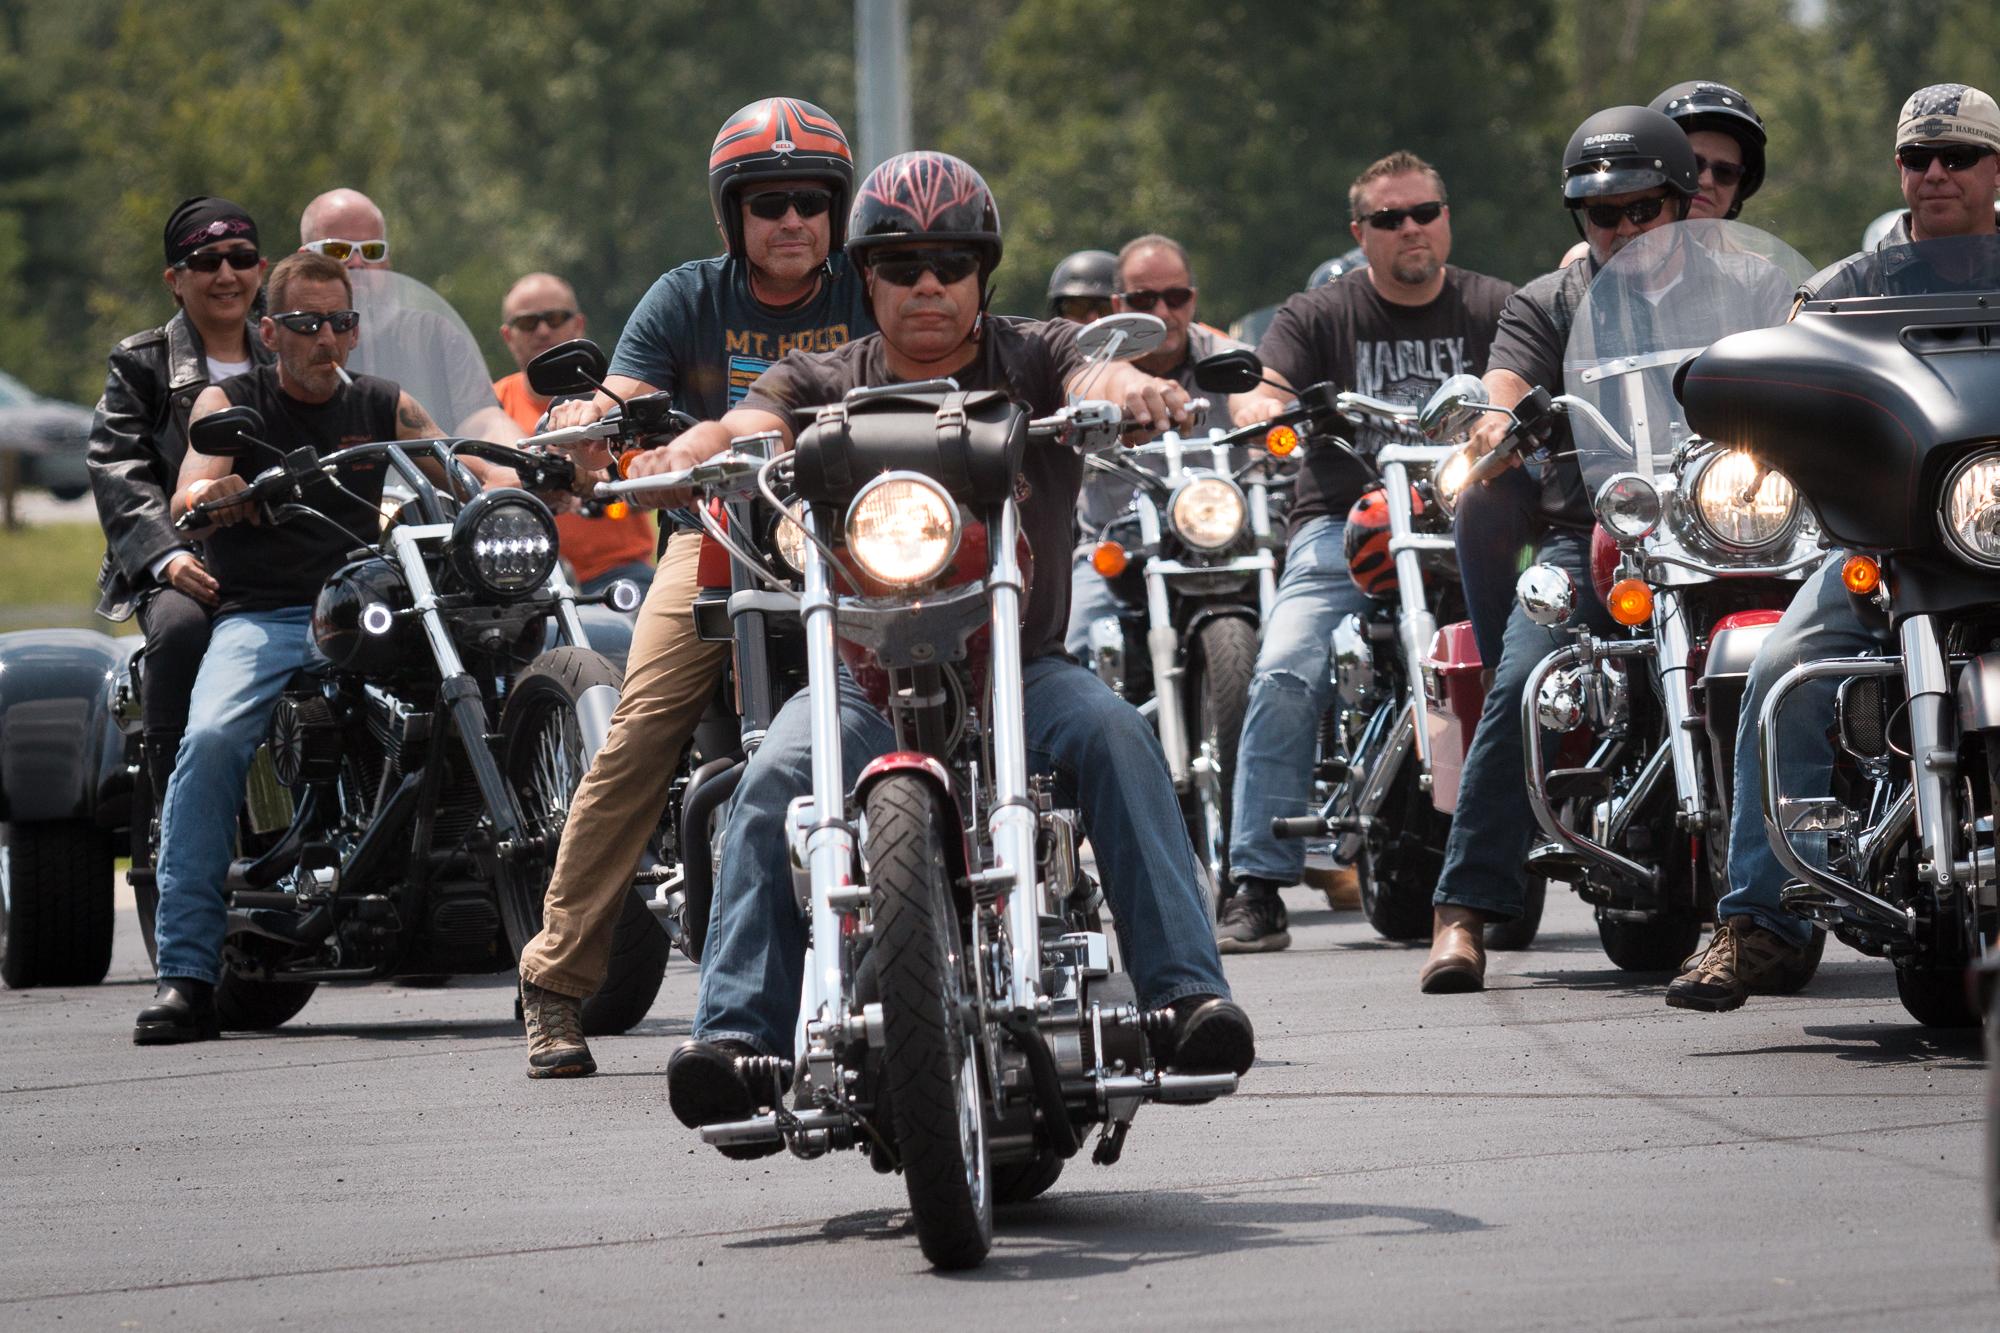 056_bikes.jpg